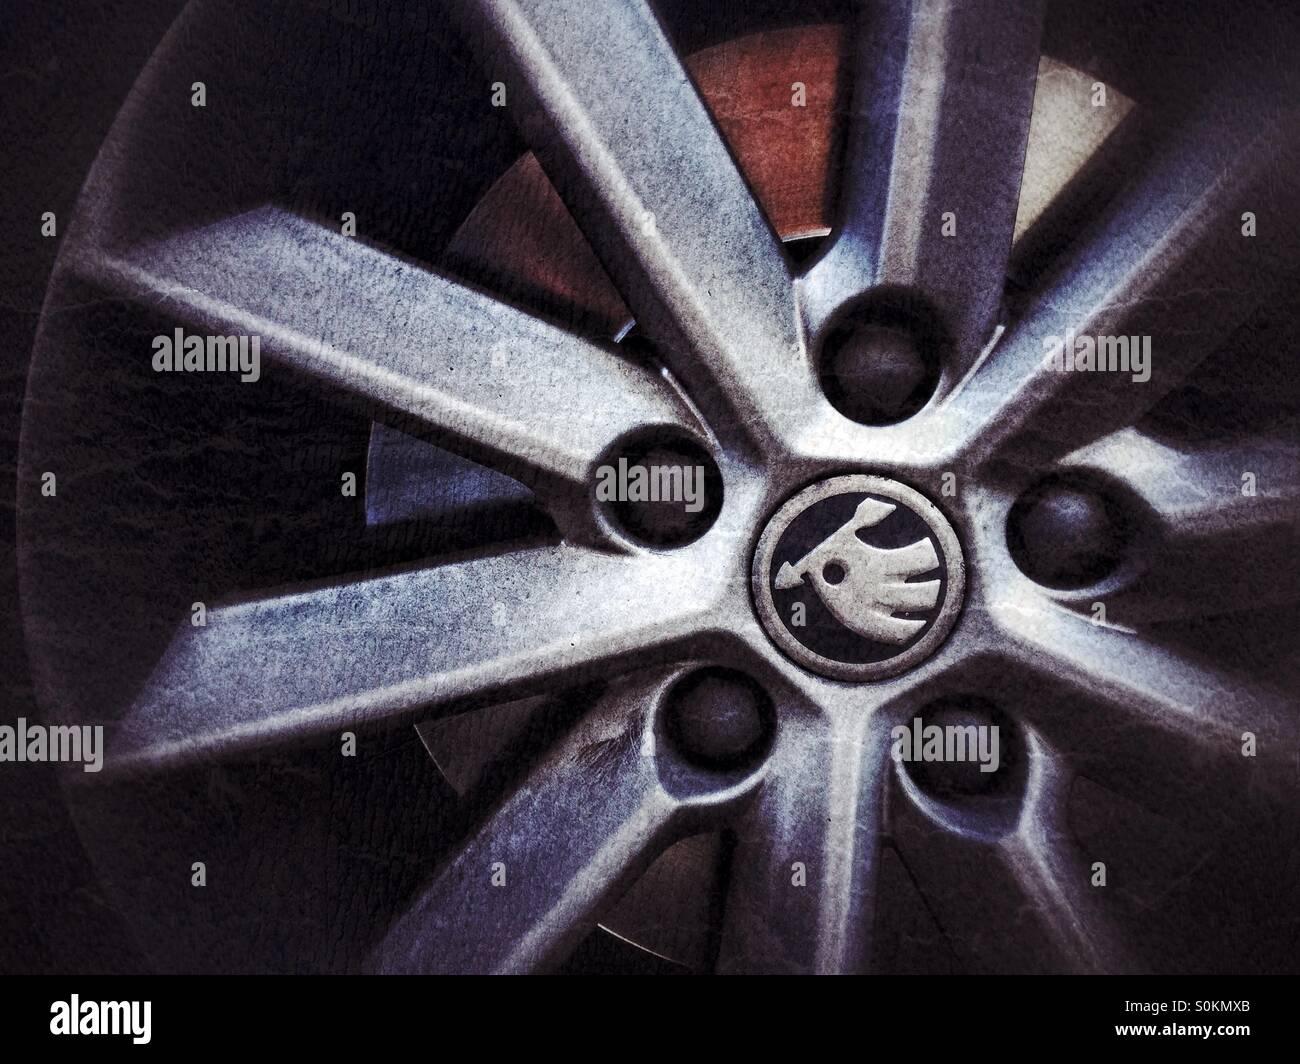 Skoda wheel - Stock Image